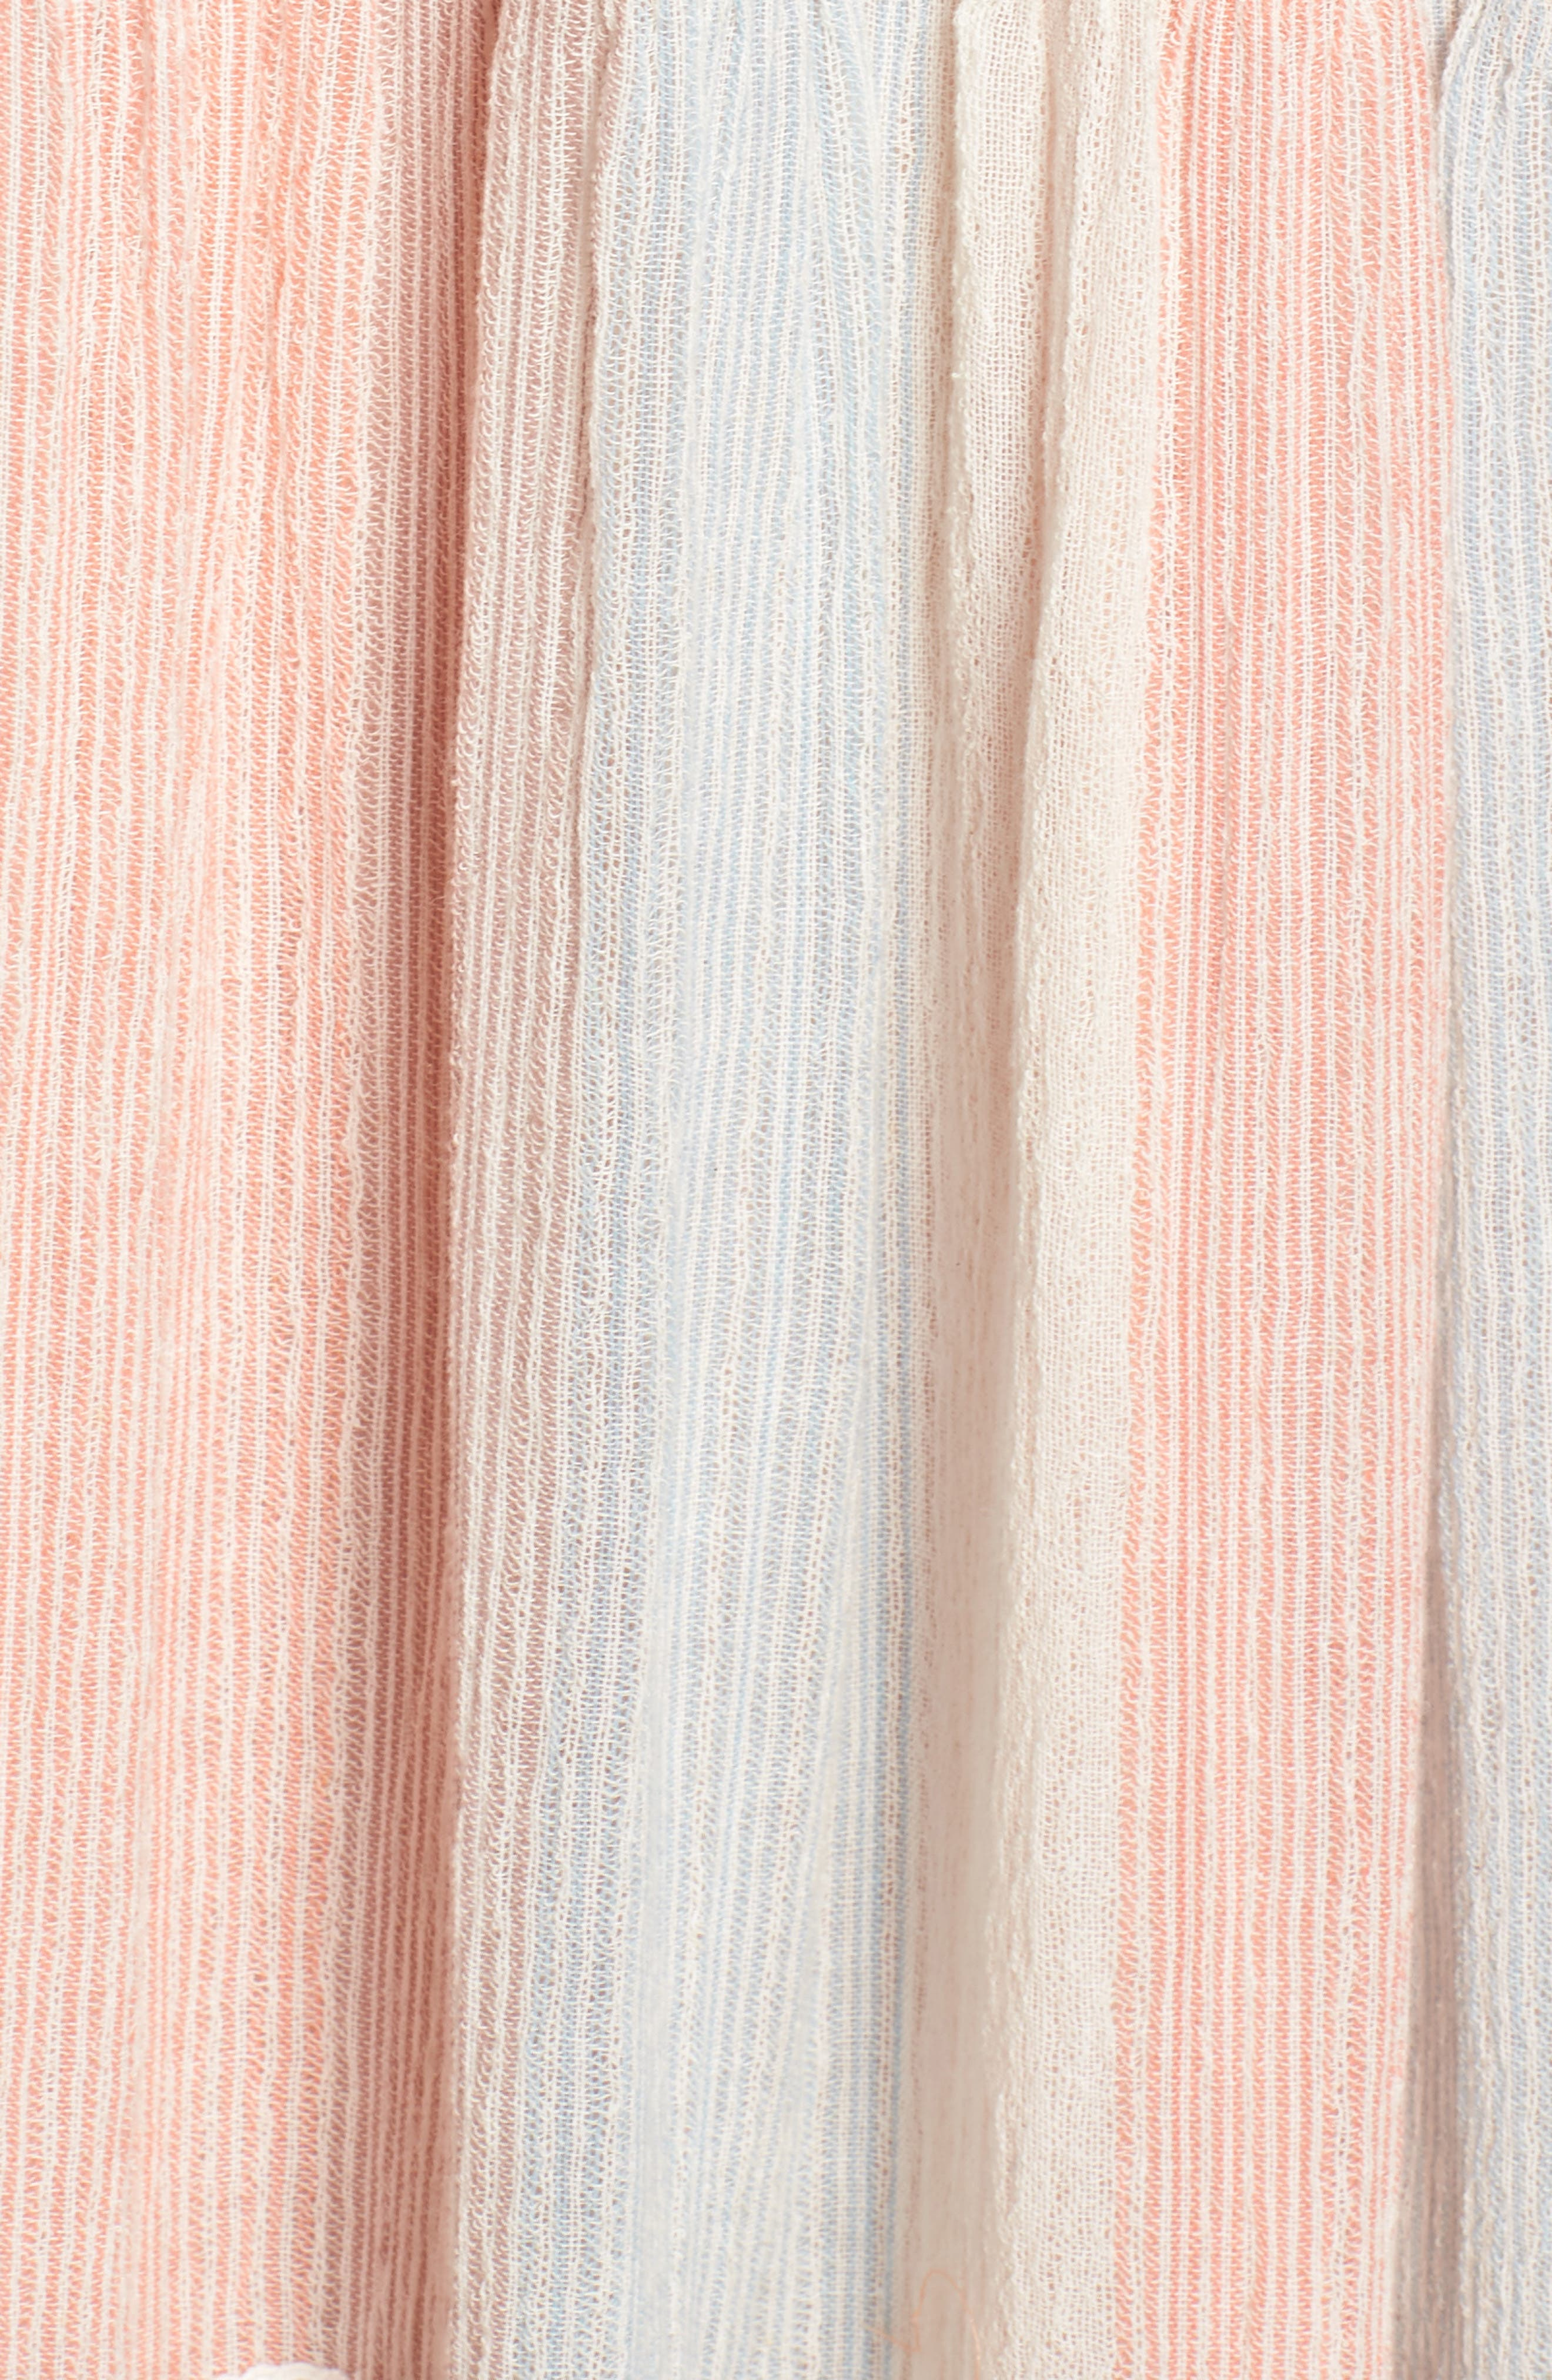 Hemant & Nandita Cover-Up Maxi Dress,                             Alternate thumbnail 5, color,                             Peach